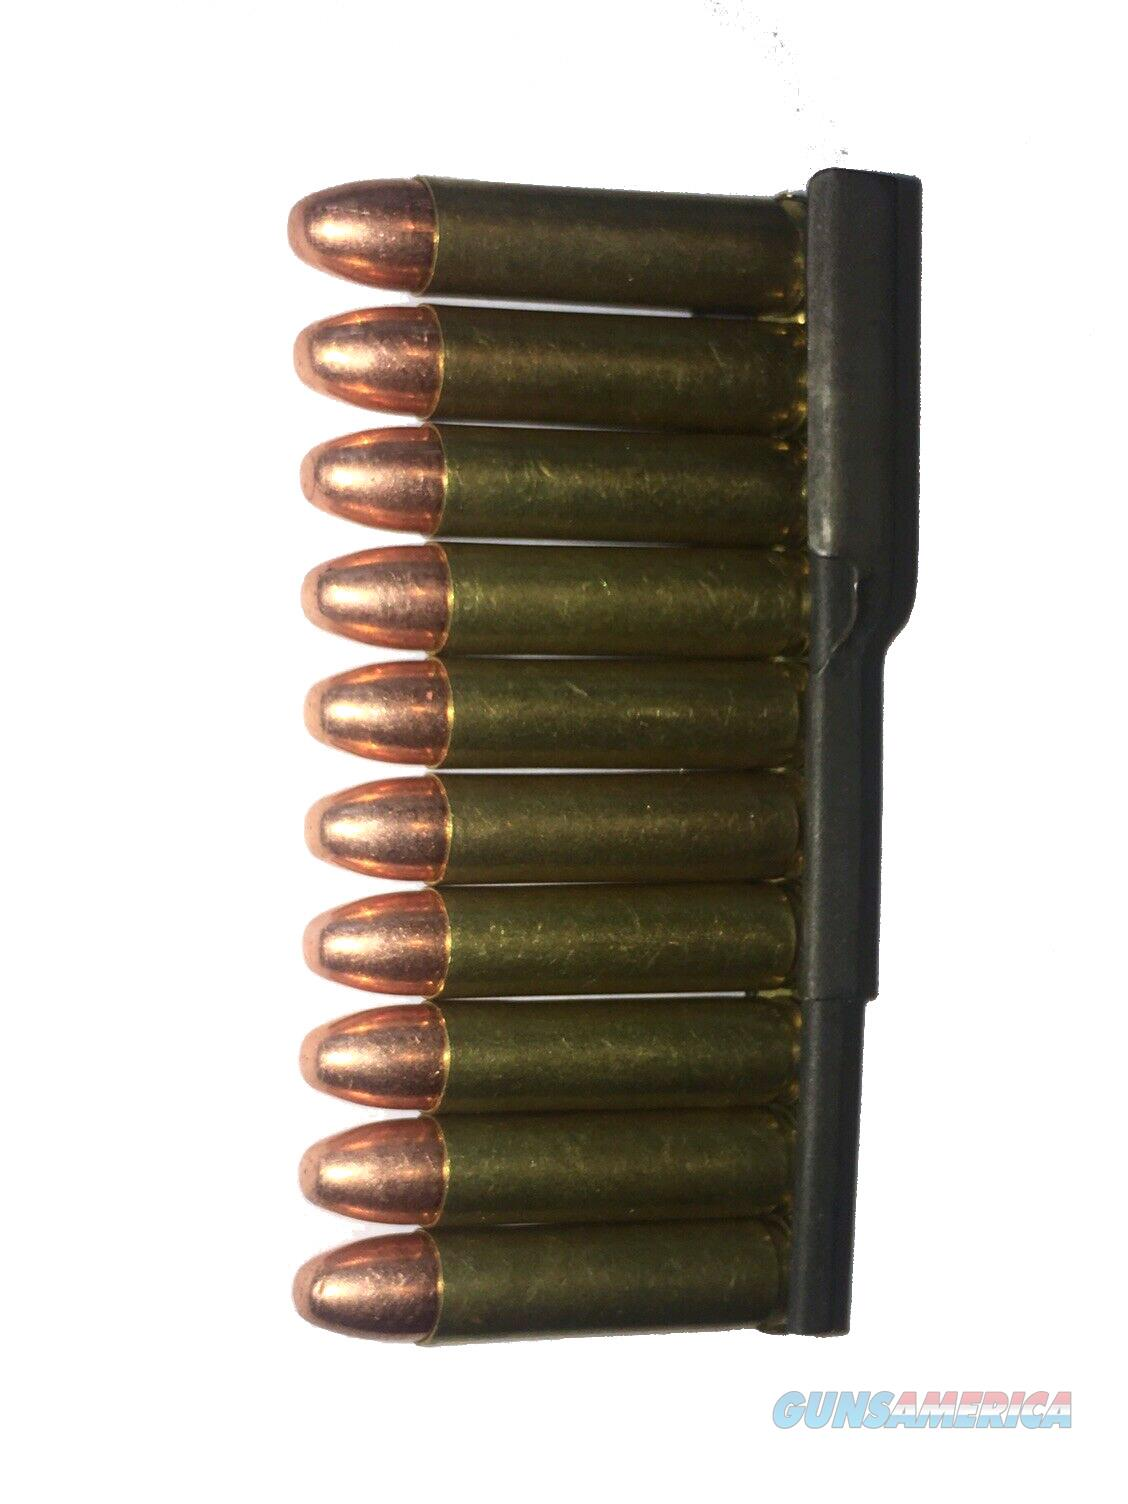 .30 Carbine Dummy Rounds in M1 Carbine Stripper Clip WWII  Non-Guns > Ammunition